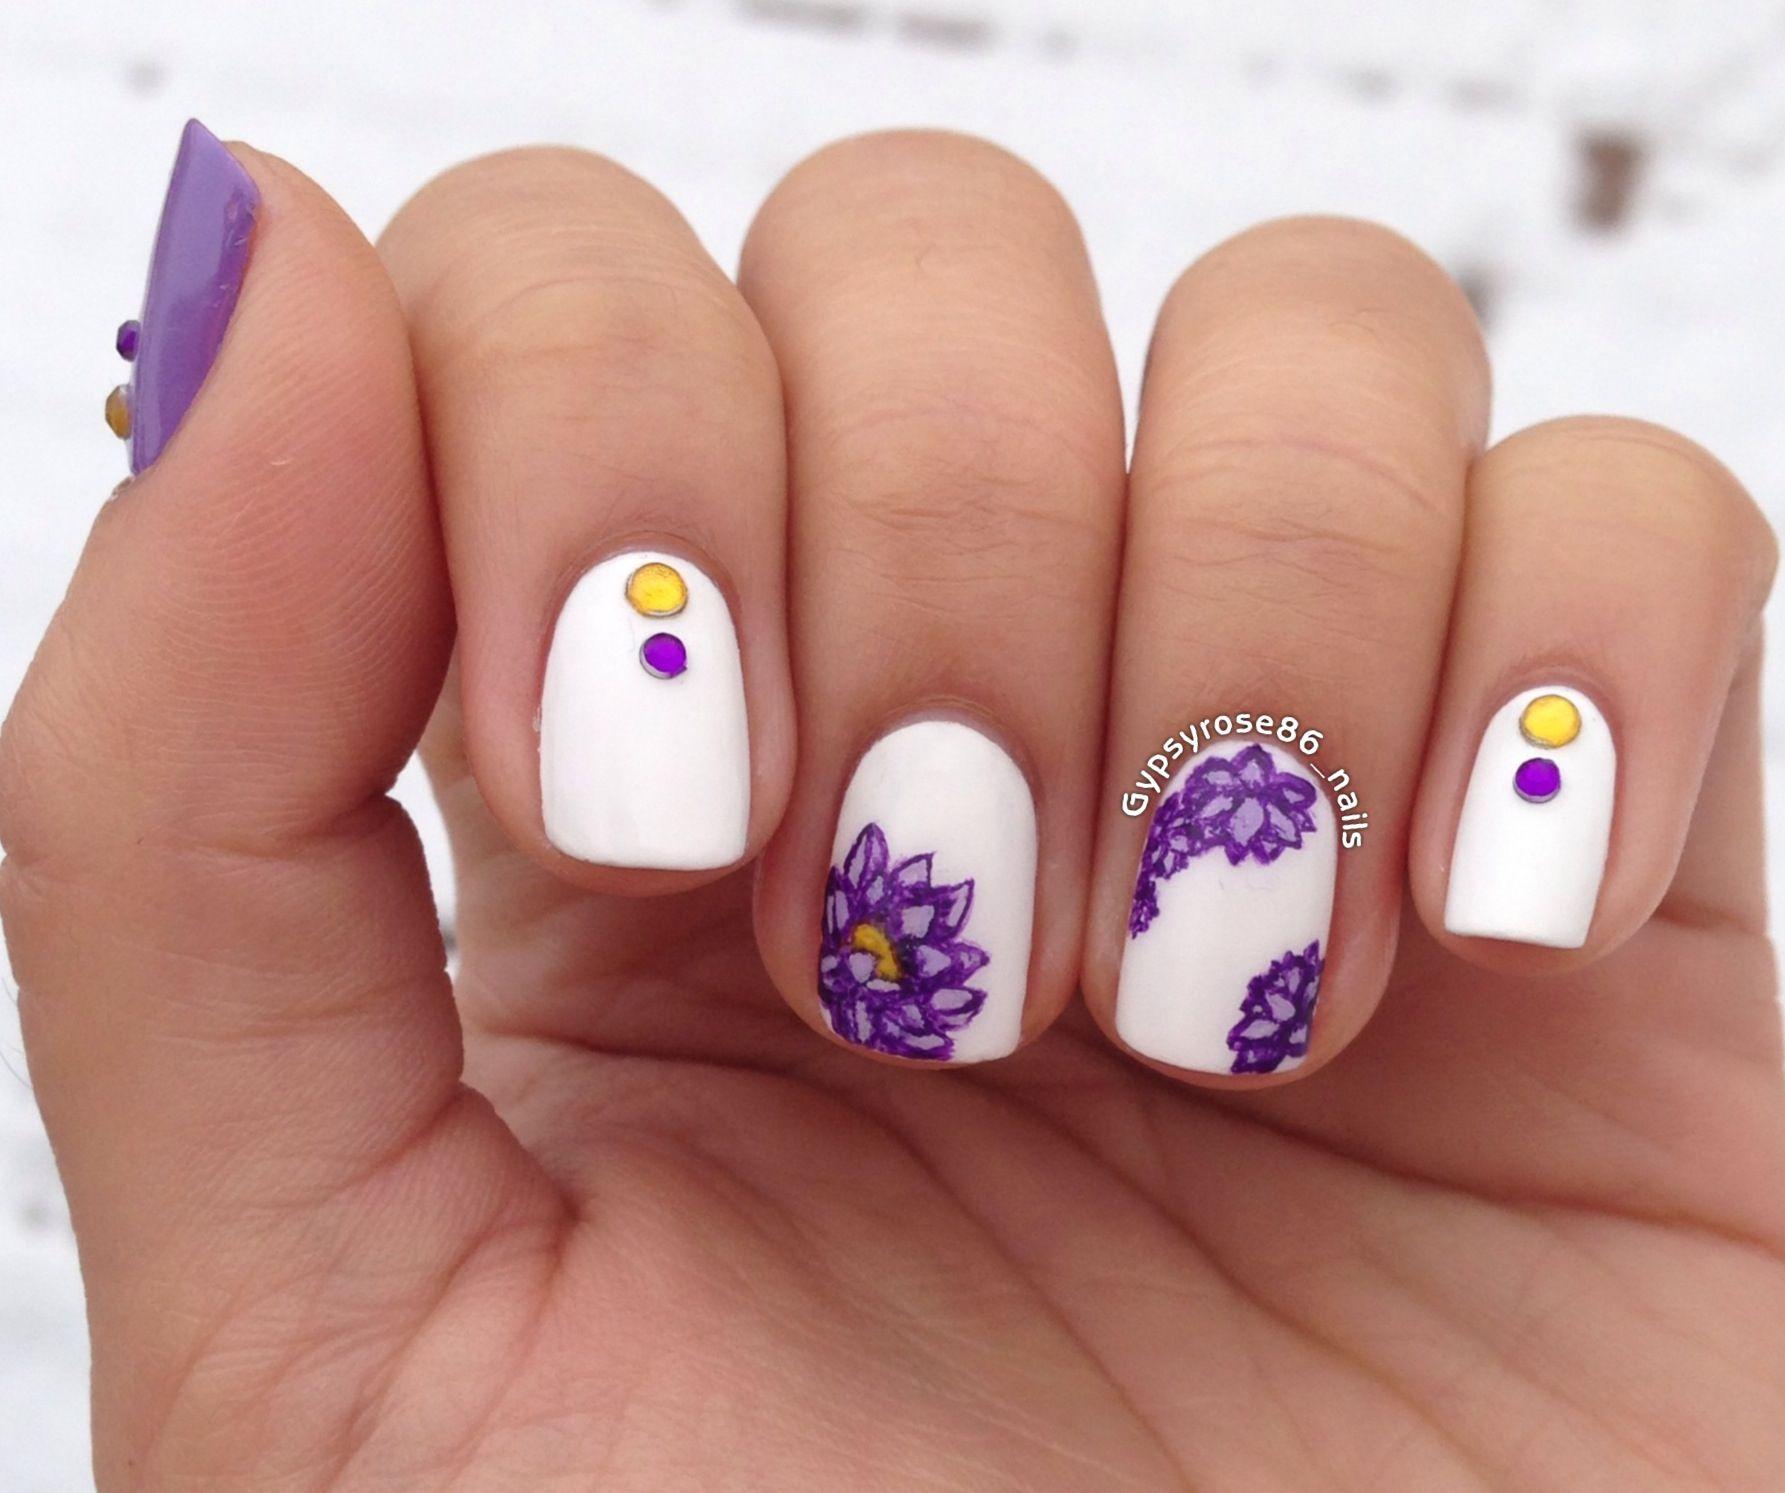 Purple lotus nails | Nails! | Pinterest | Lotus and Makeup